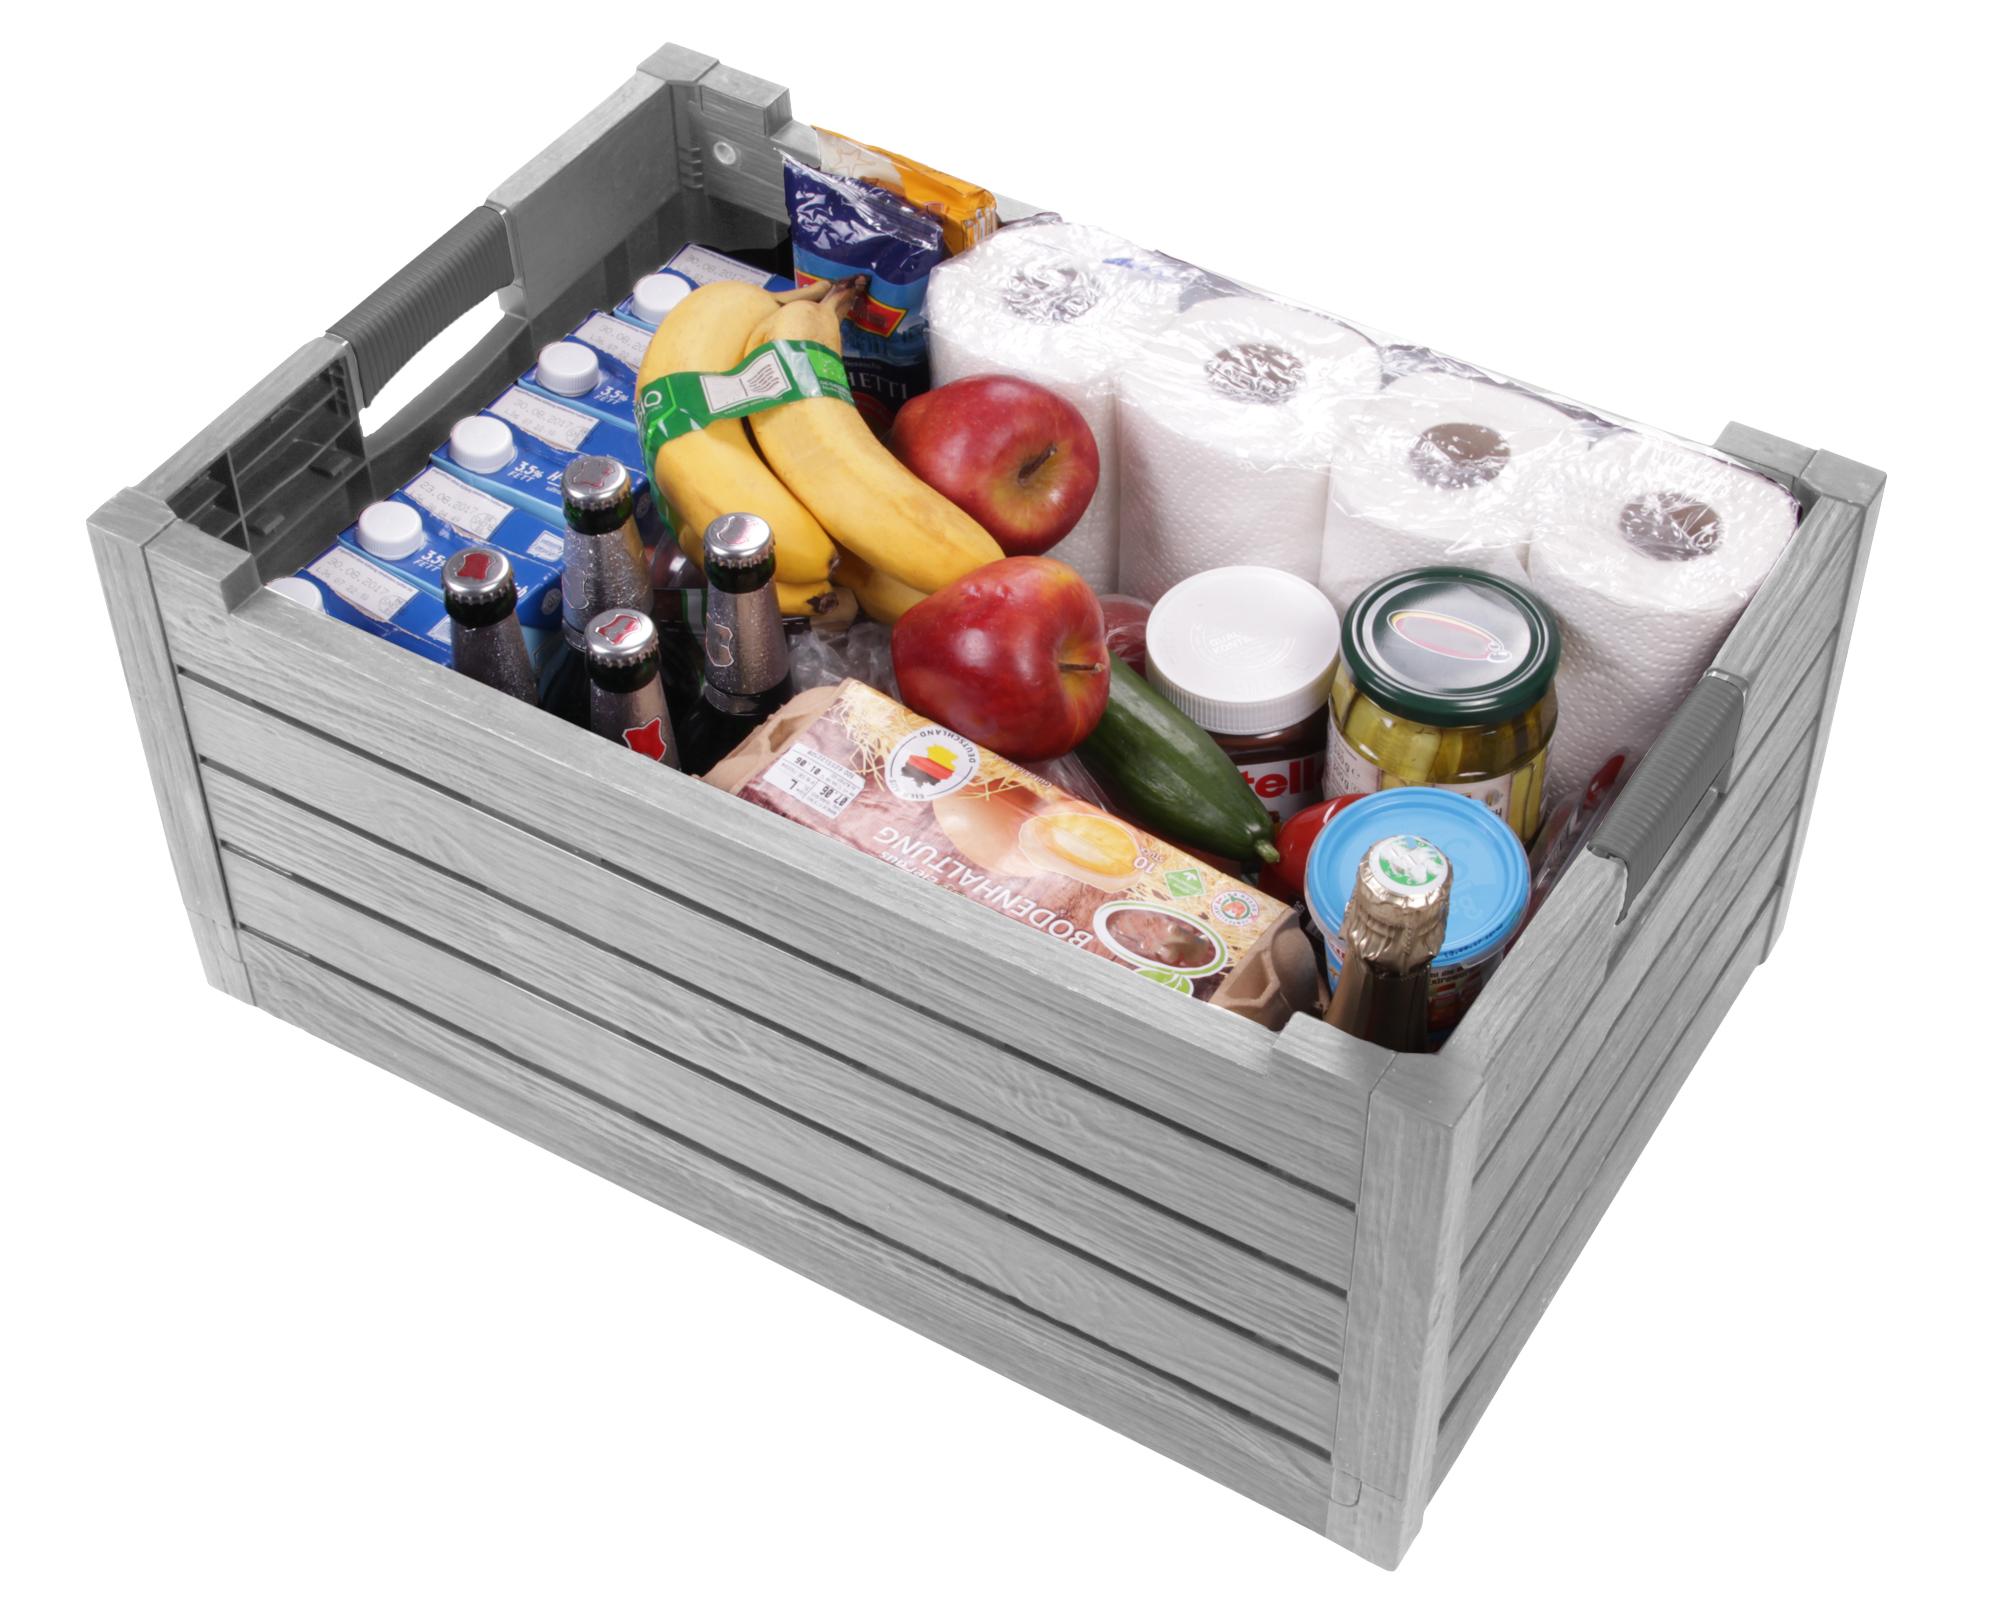 ondis24 klappbox faltbox transportkiste einkaufskorb. Black Bedroom Furniture Sets. Home Design Ideas